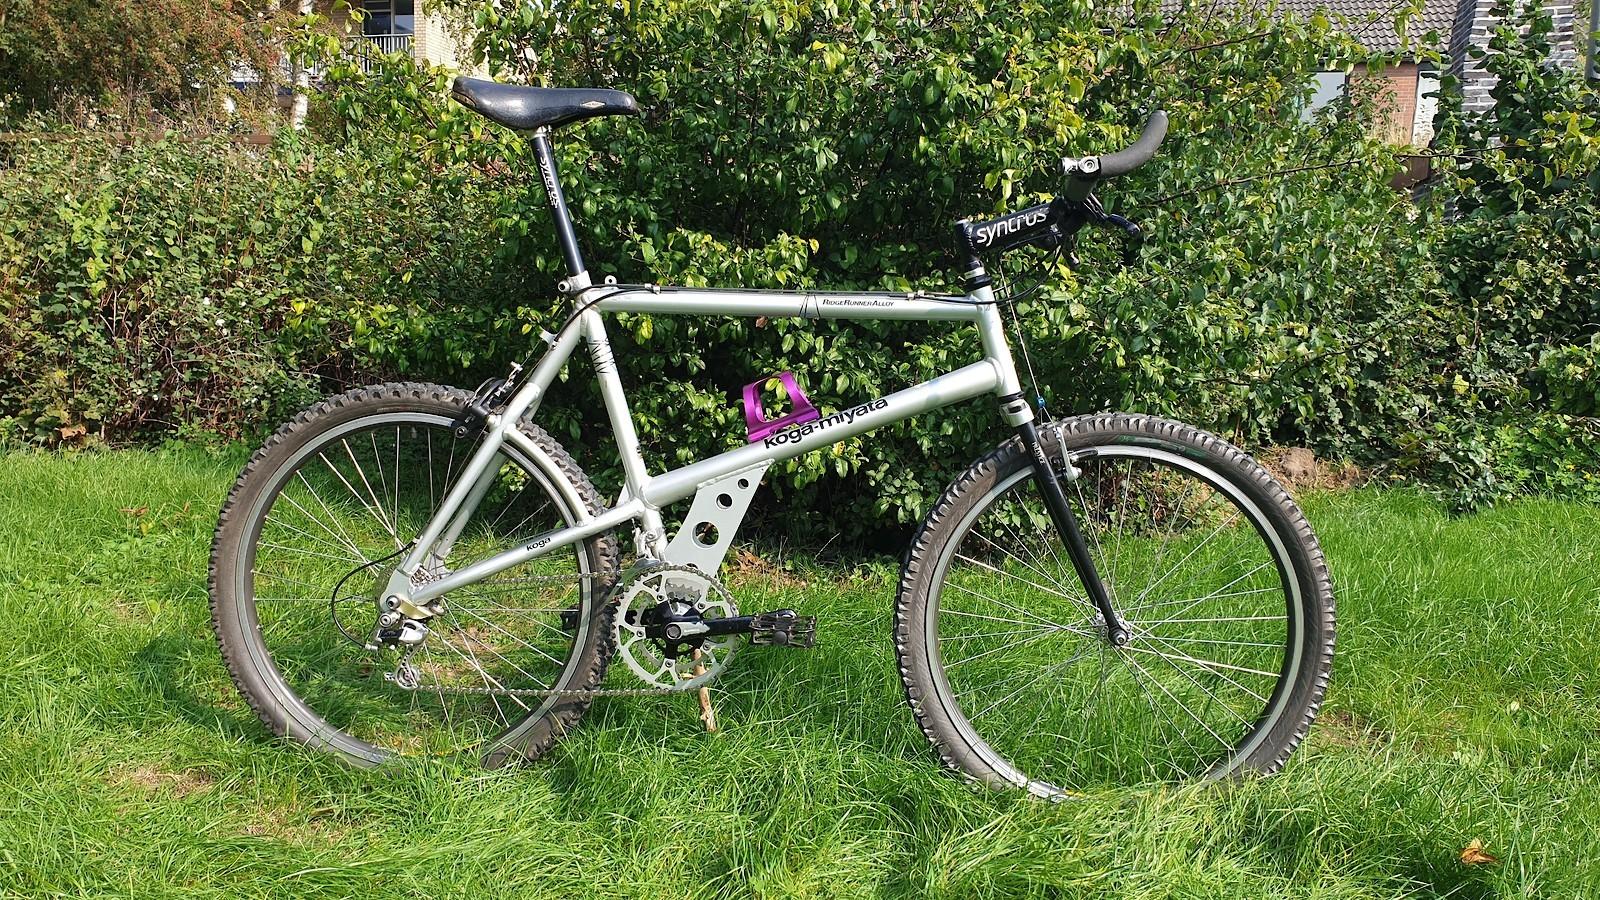 Koga Miyata RidgeRunner Alloy 1990 - Vital Bike of the Day December 2020 - Mountain Biking Pictures - Vital MTB